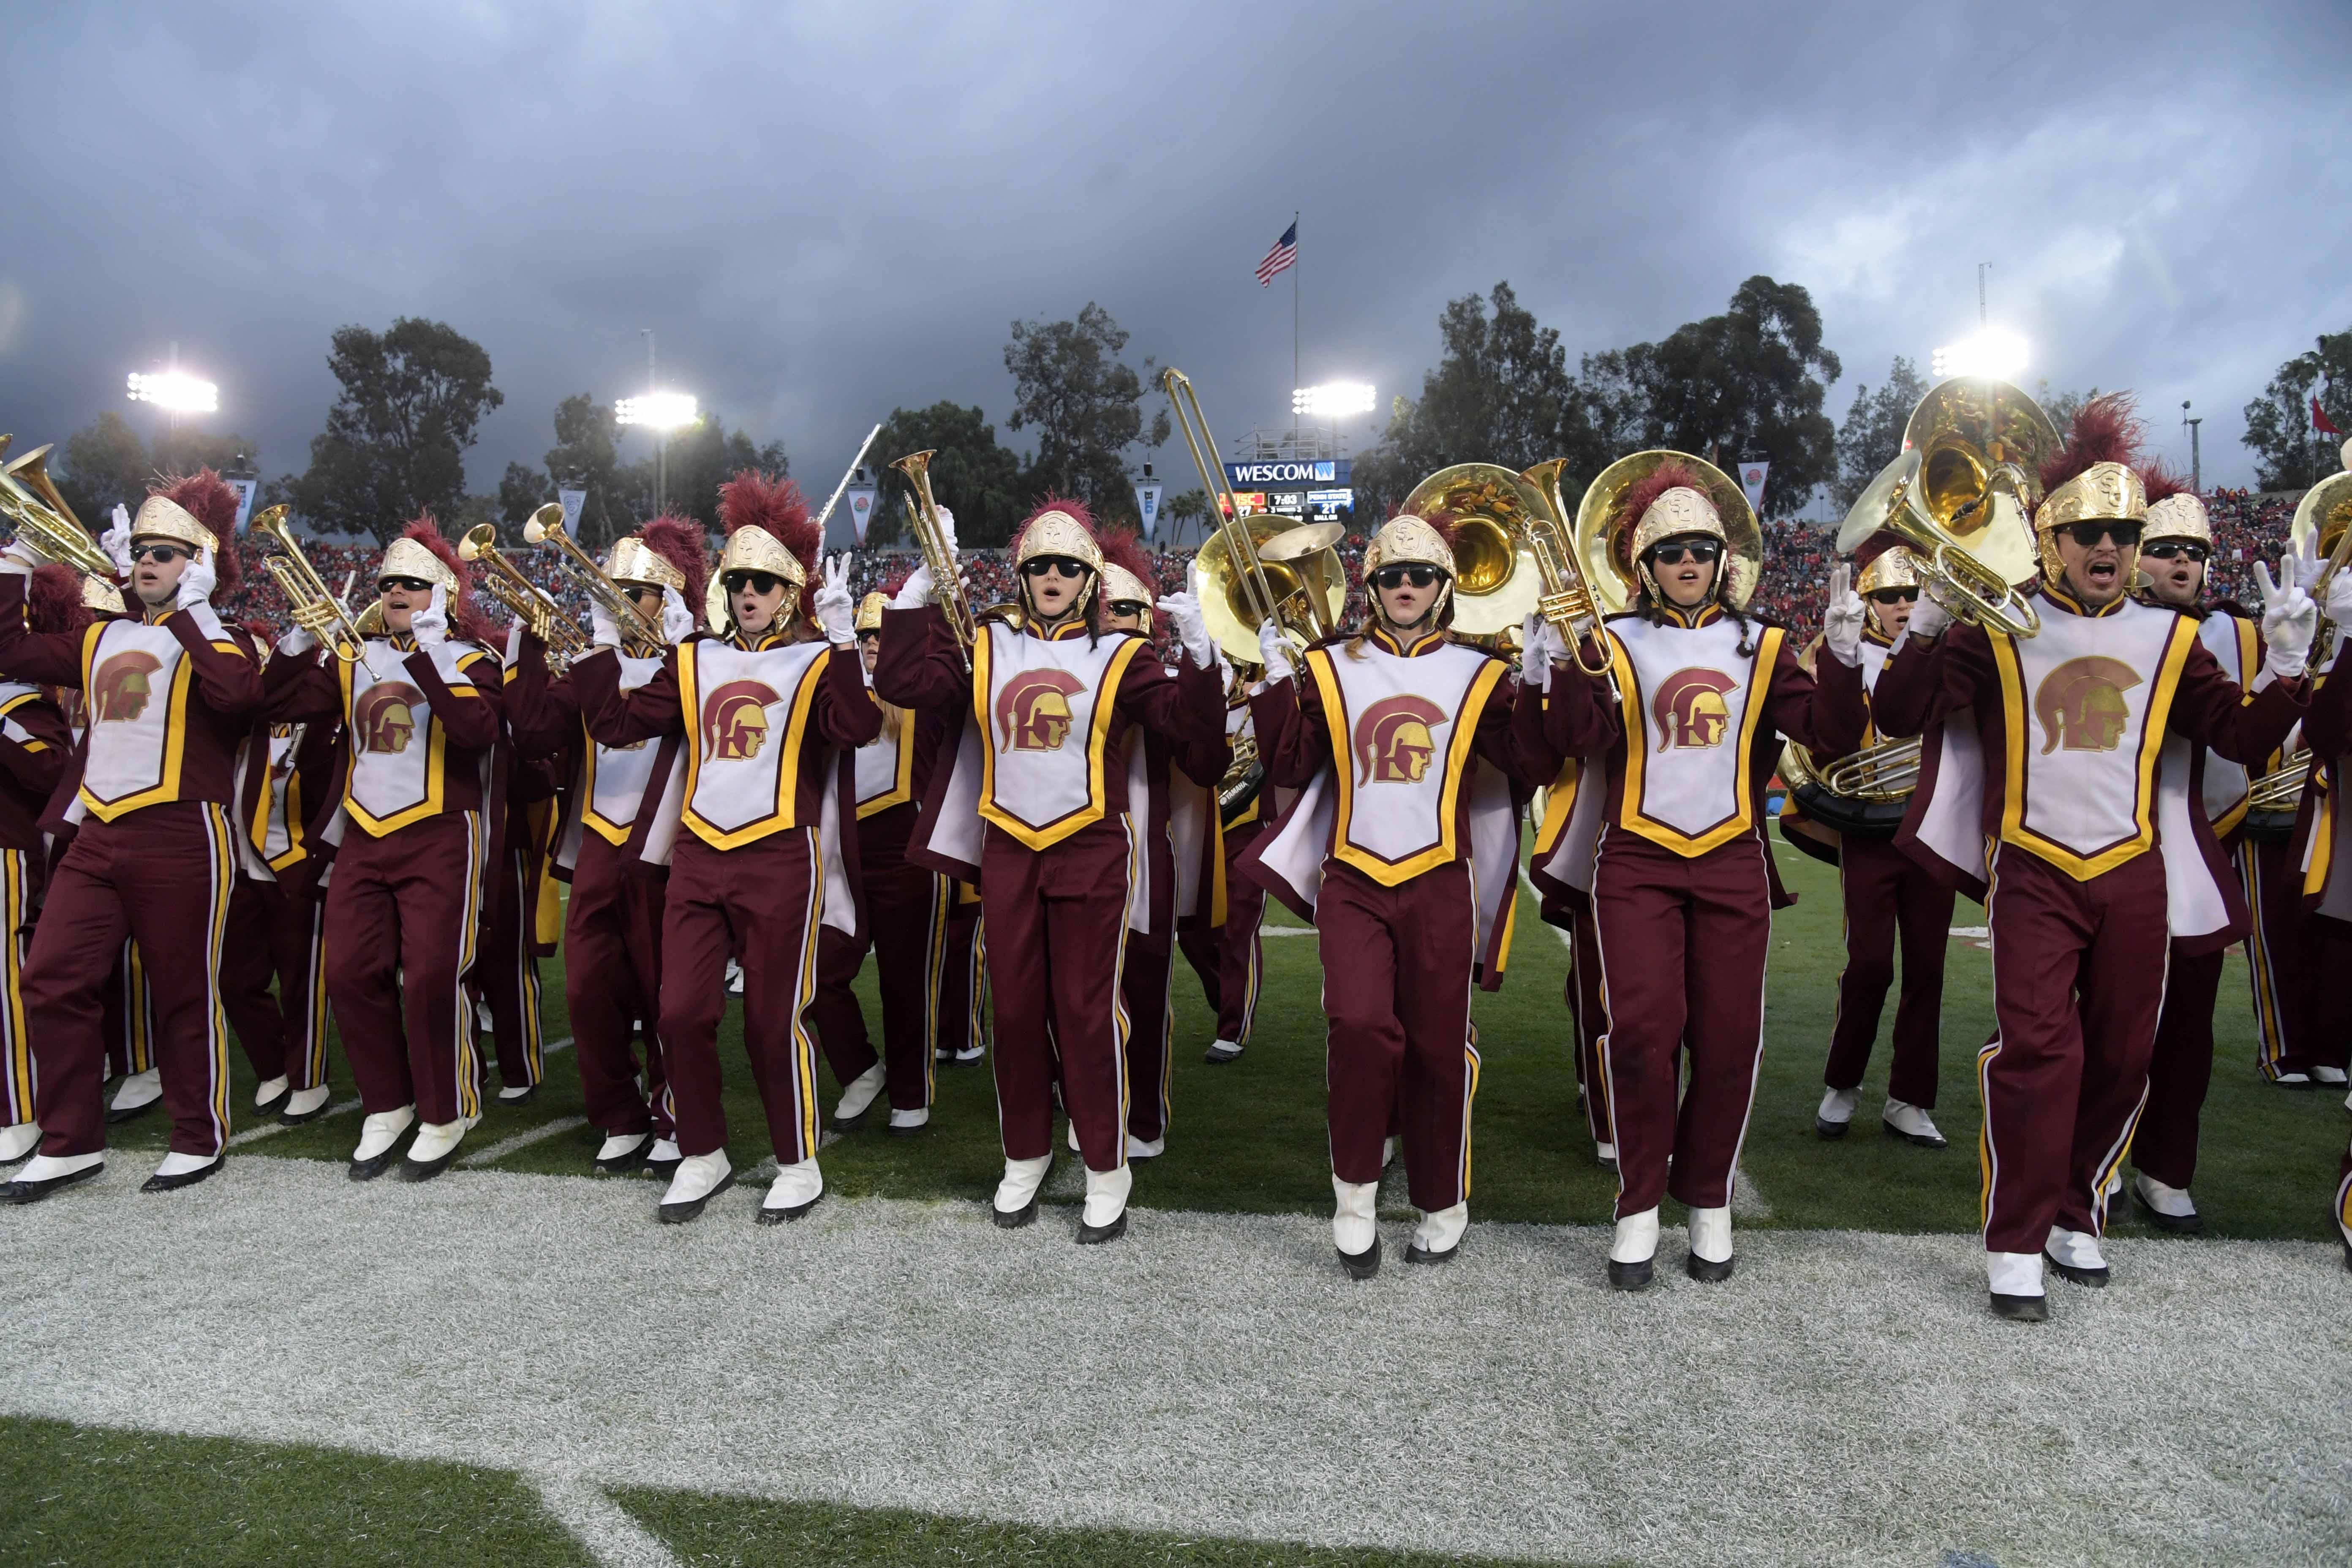 9801291-ncaa-football-rose-bowl-game-penn-state-vs-southern-california